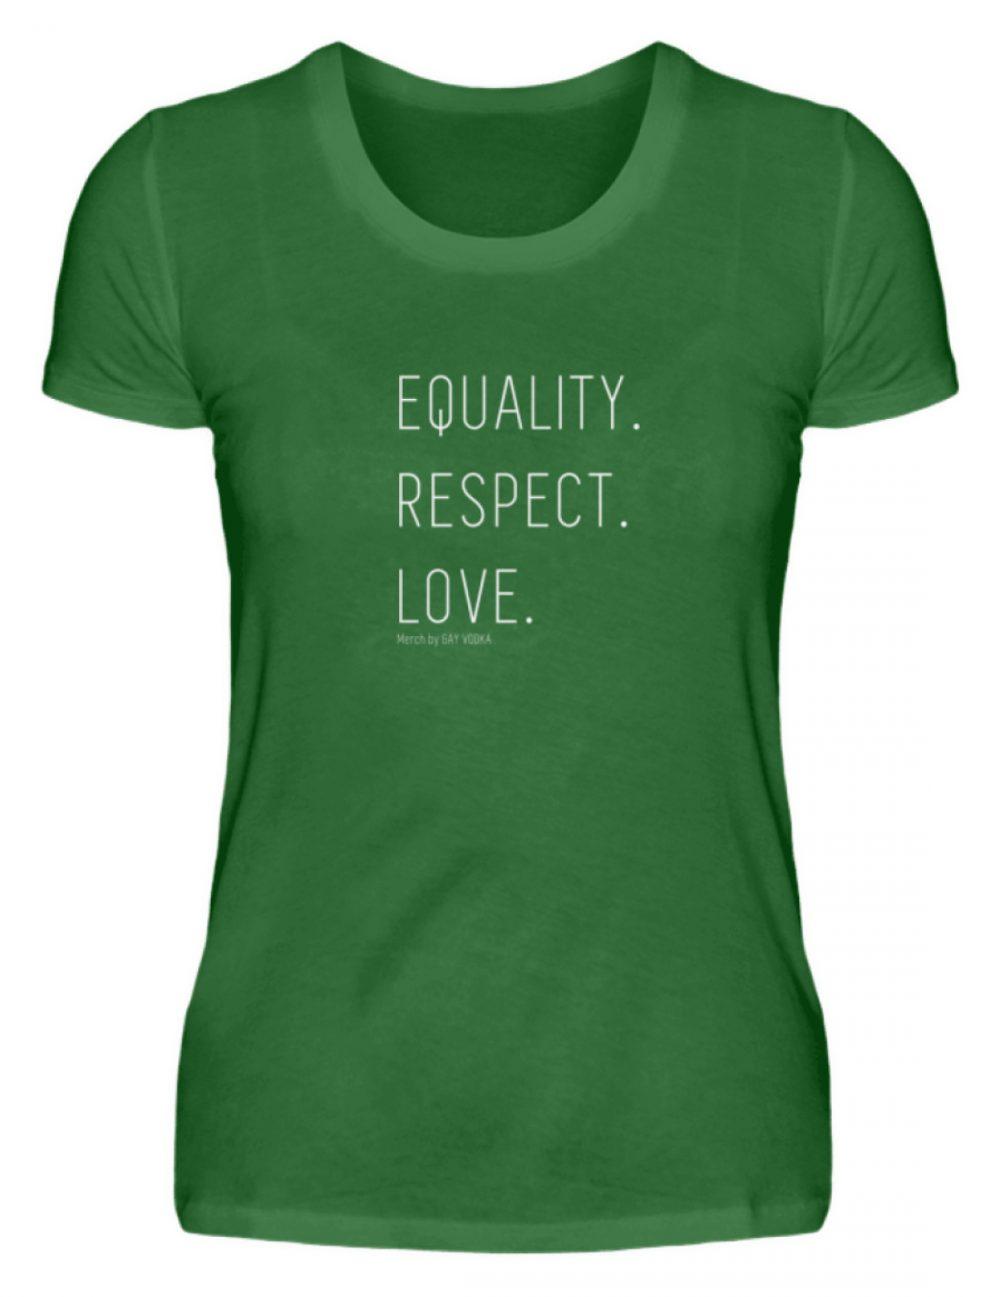 EQUALITY. RESPECT. LOVE. - Damen Premiumshirt-30